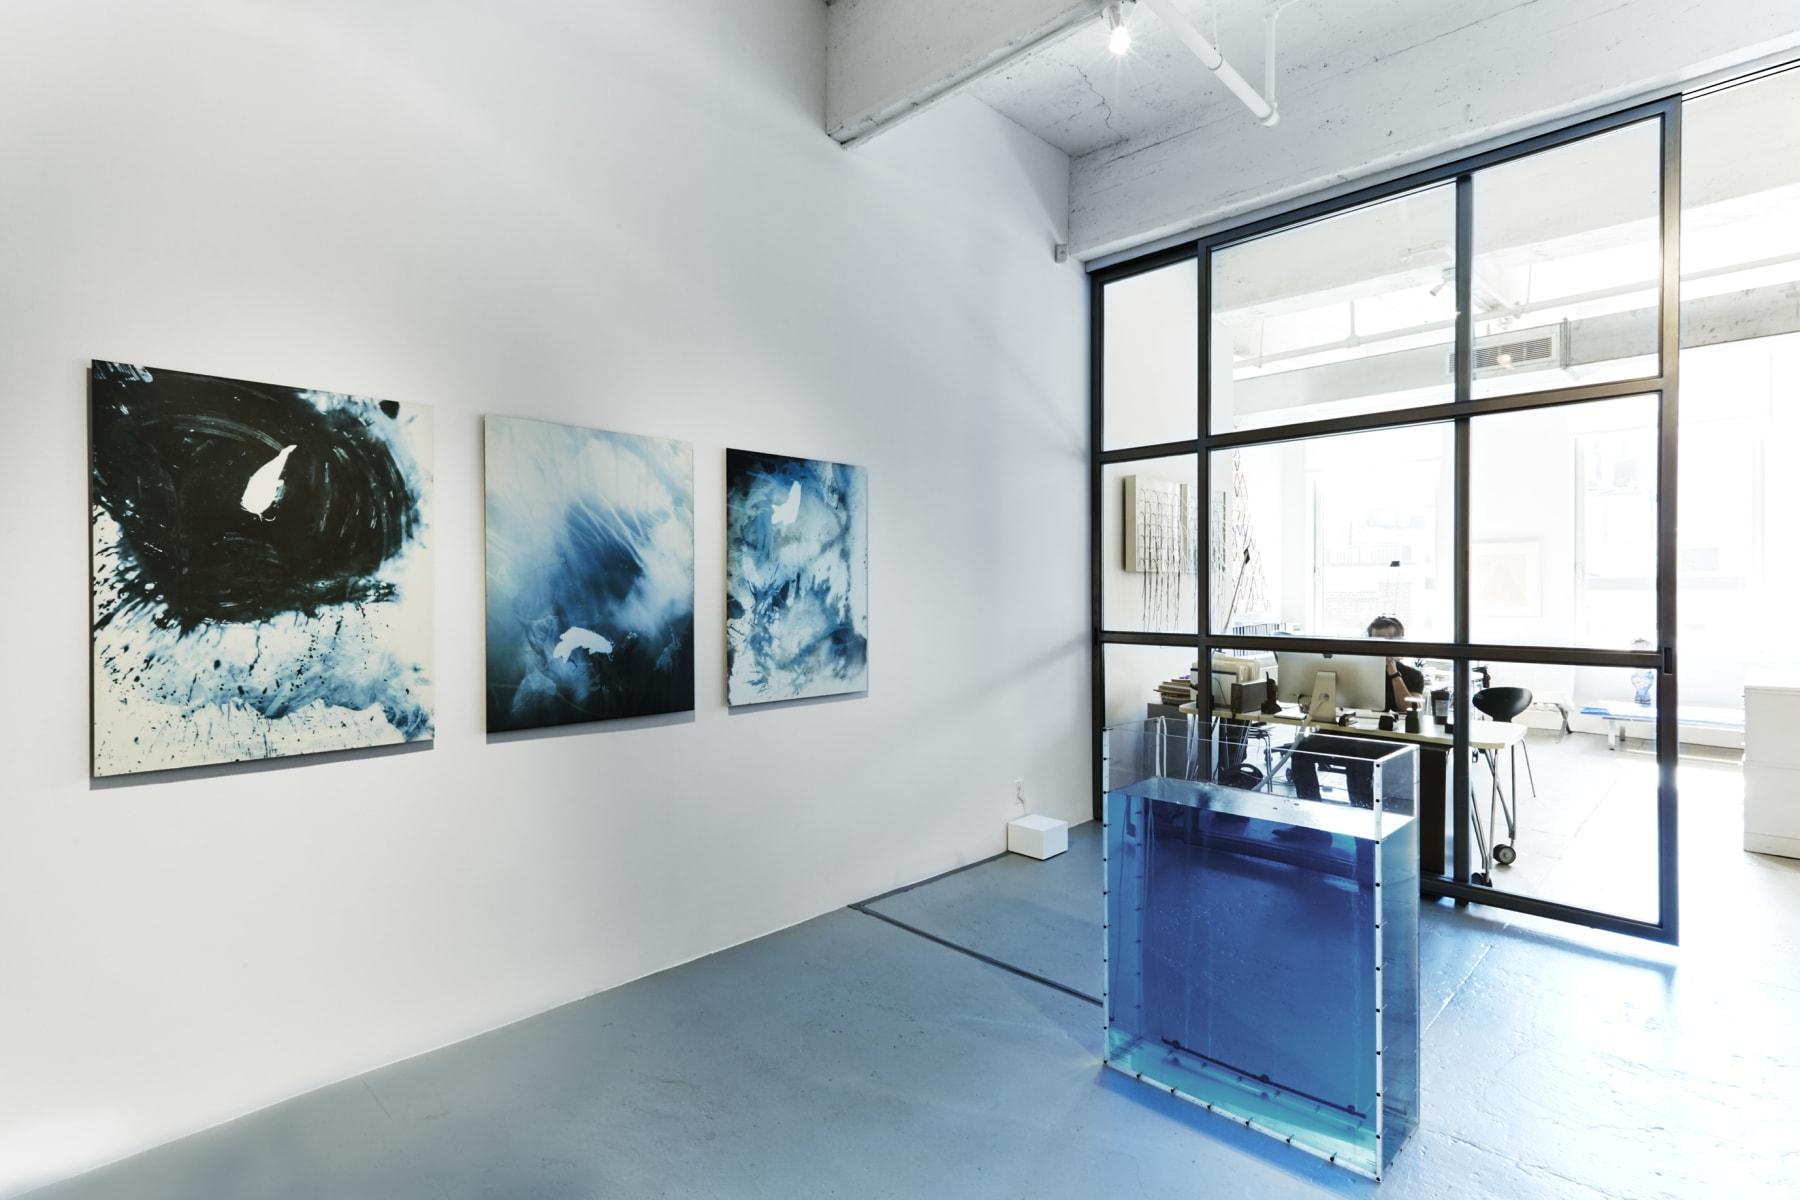 Kunié Sugiura, Water tank, with choice of 2 prints from Namu series, 1992